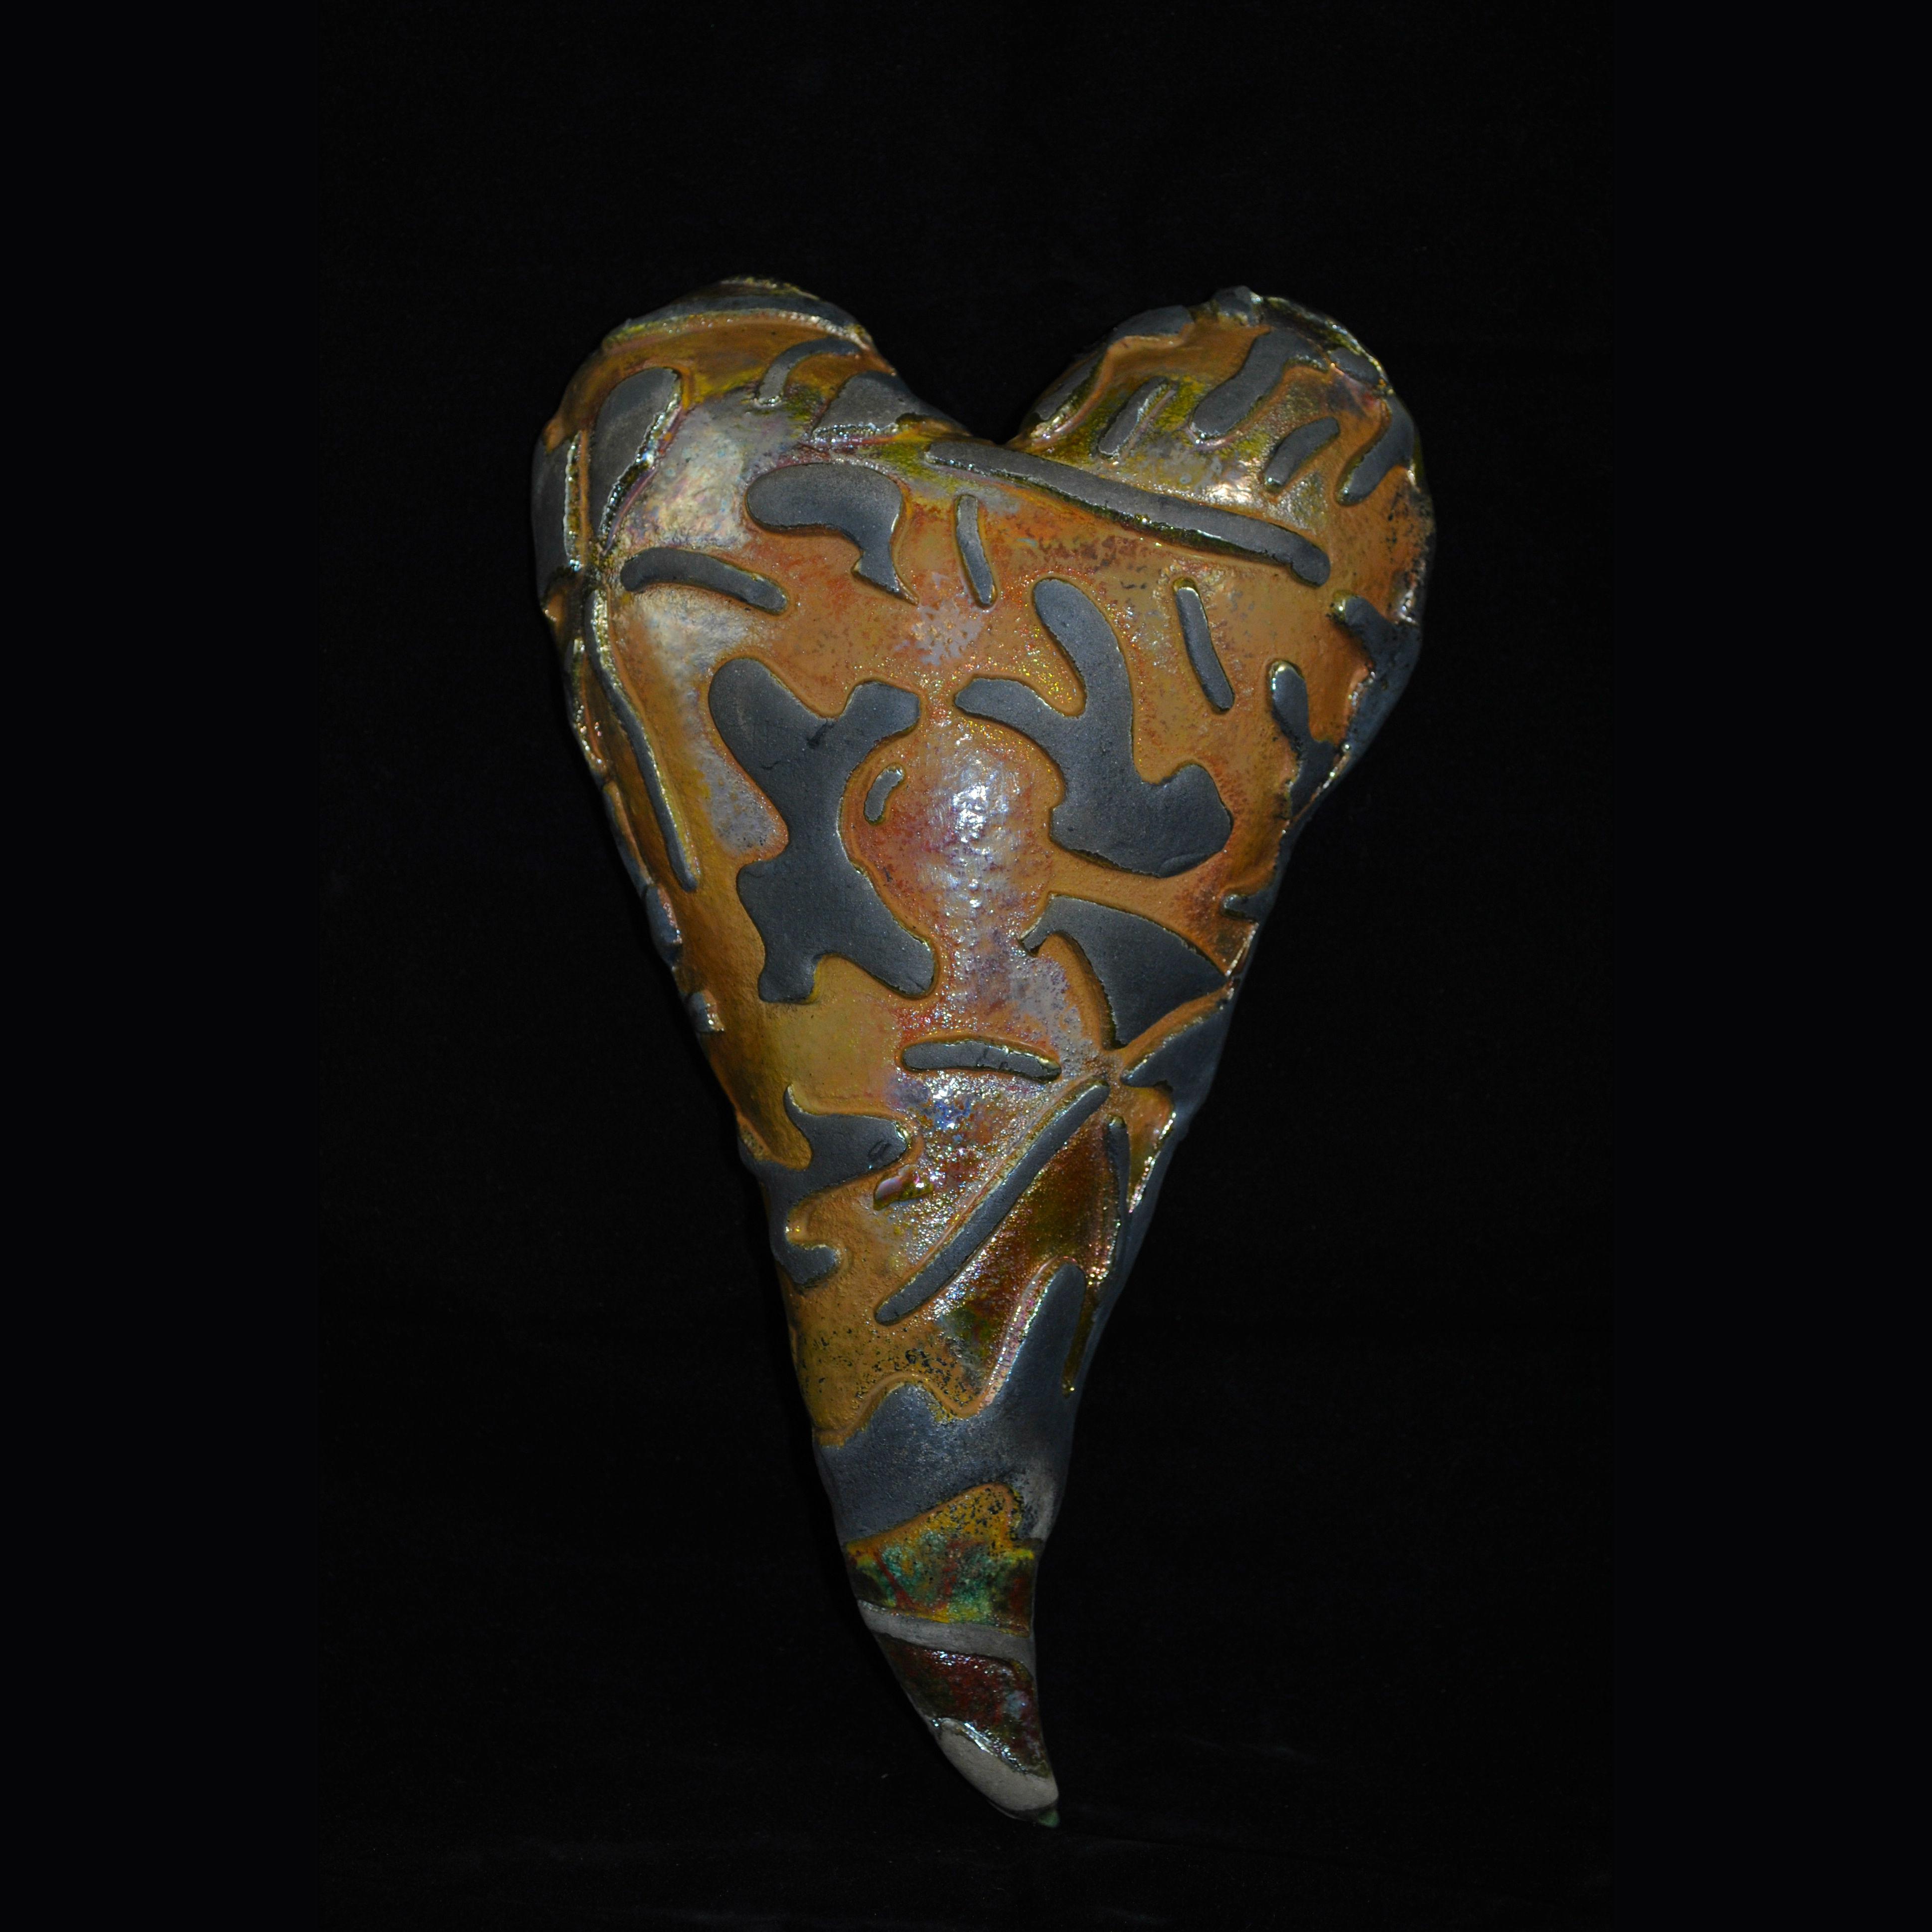 Heart in Raku